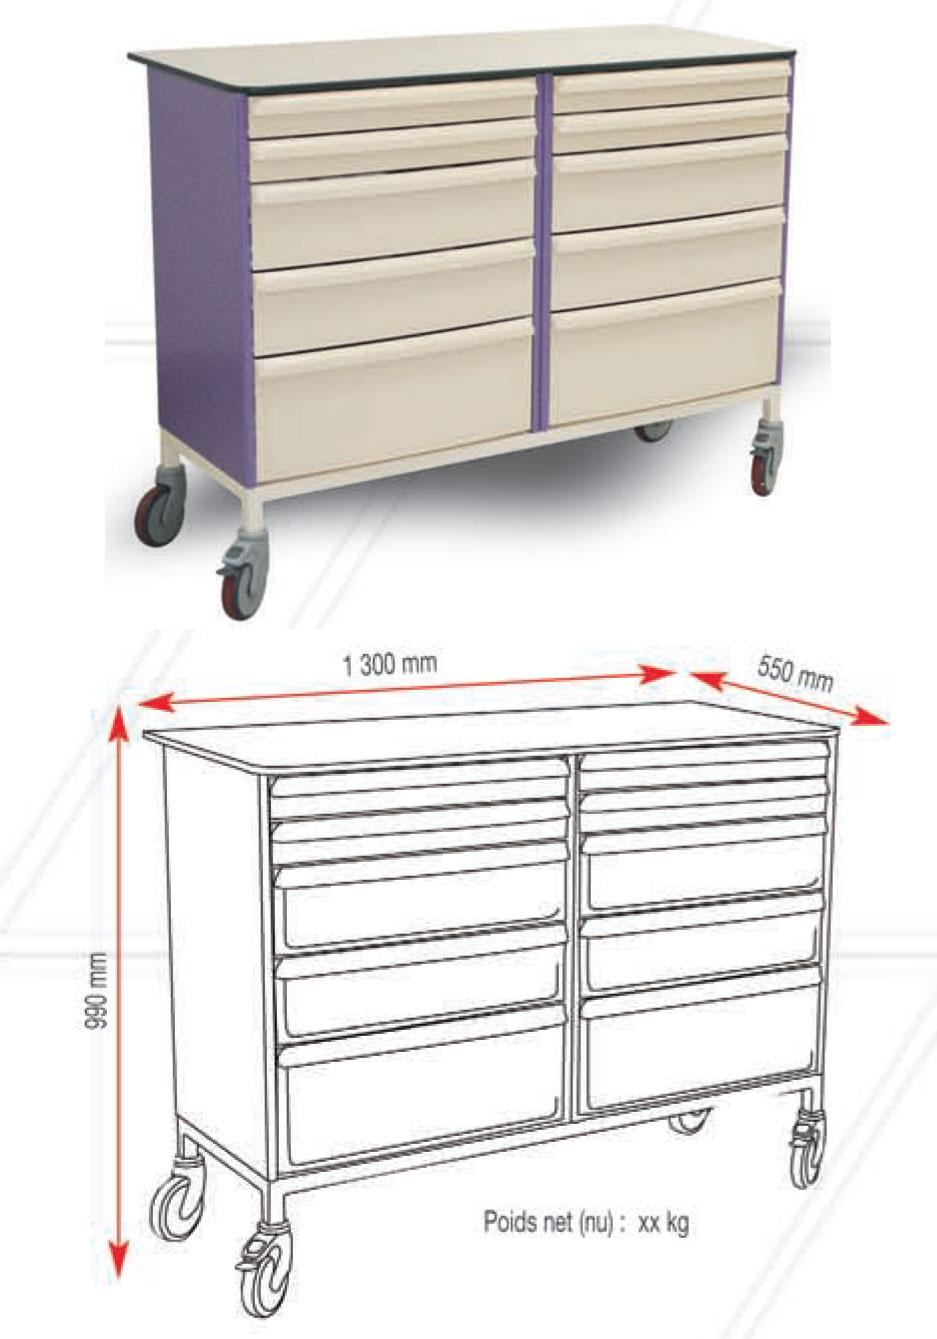 delta scientifique m dical distribution mat riel m dical equipements hospitaliers plan de. Black Bedroom Furniture Sets. Home Design Ideas